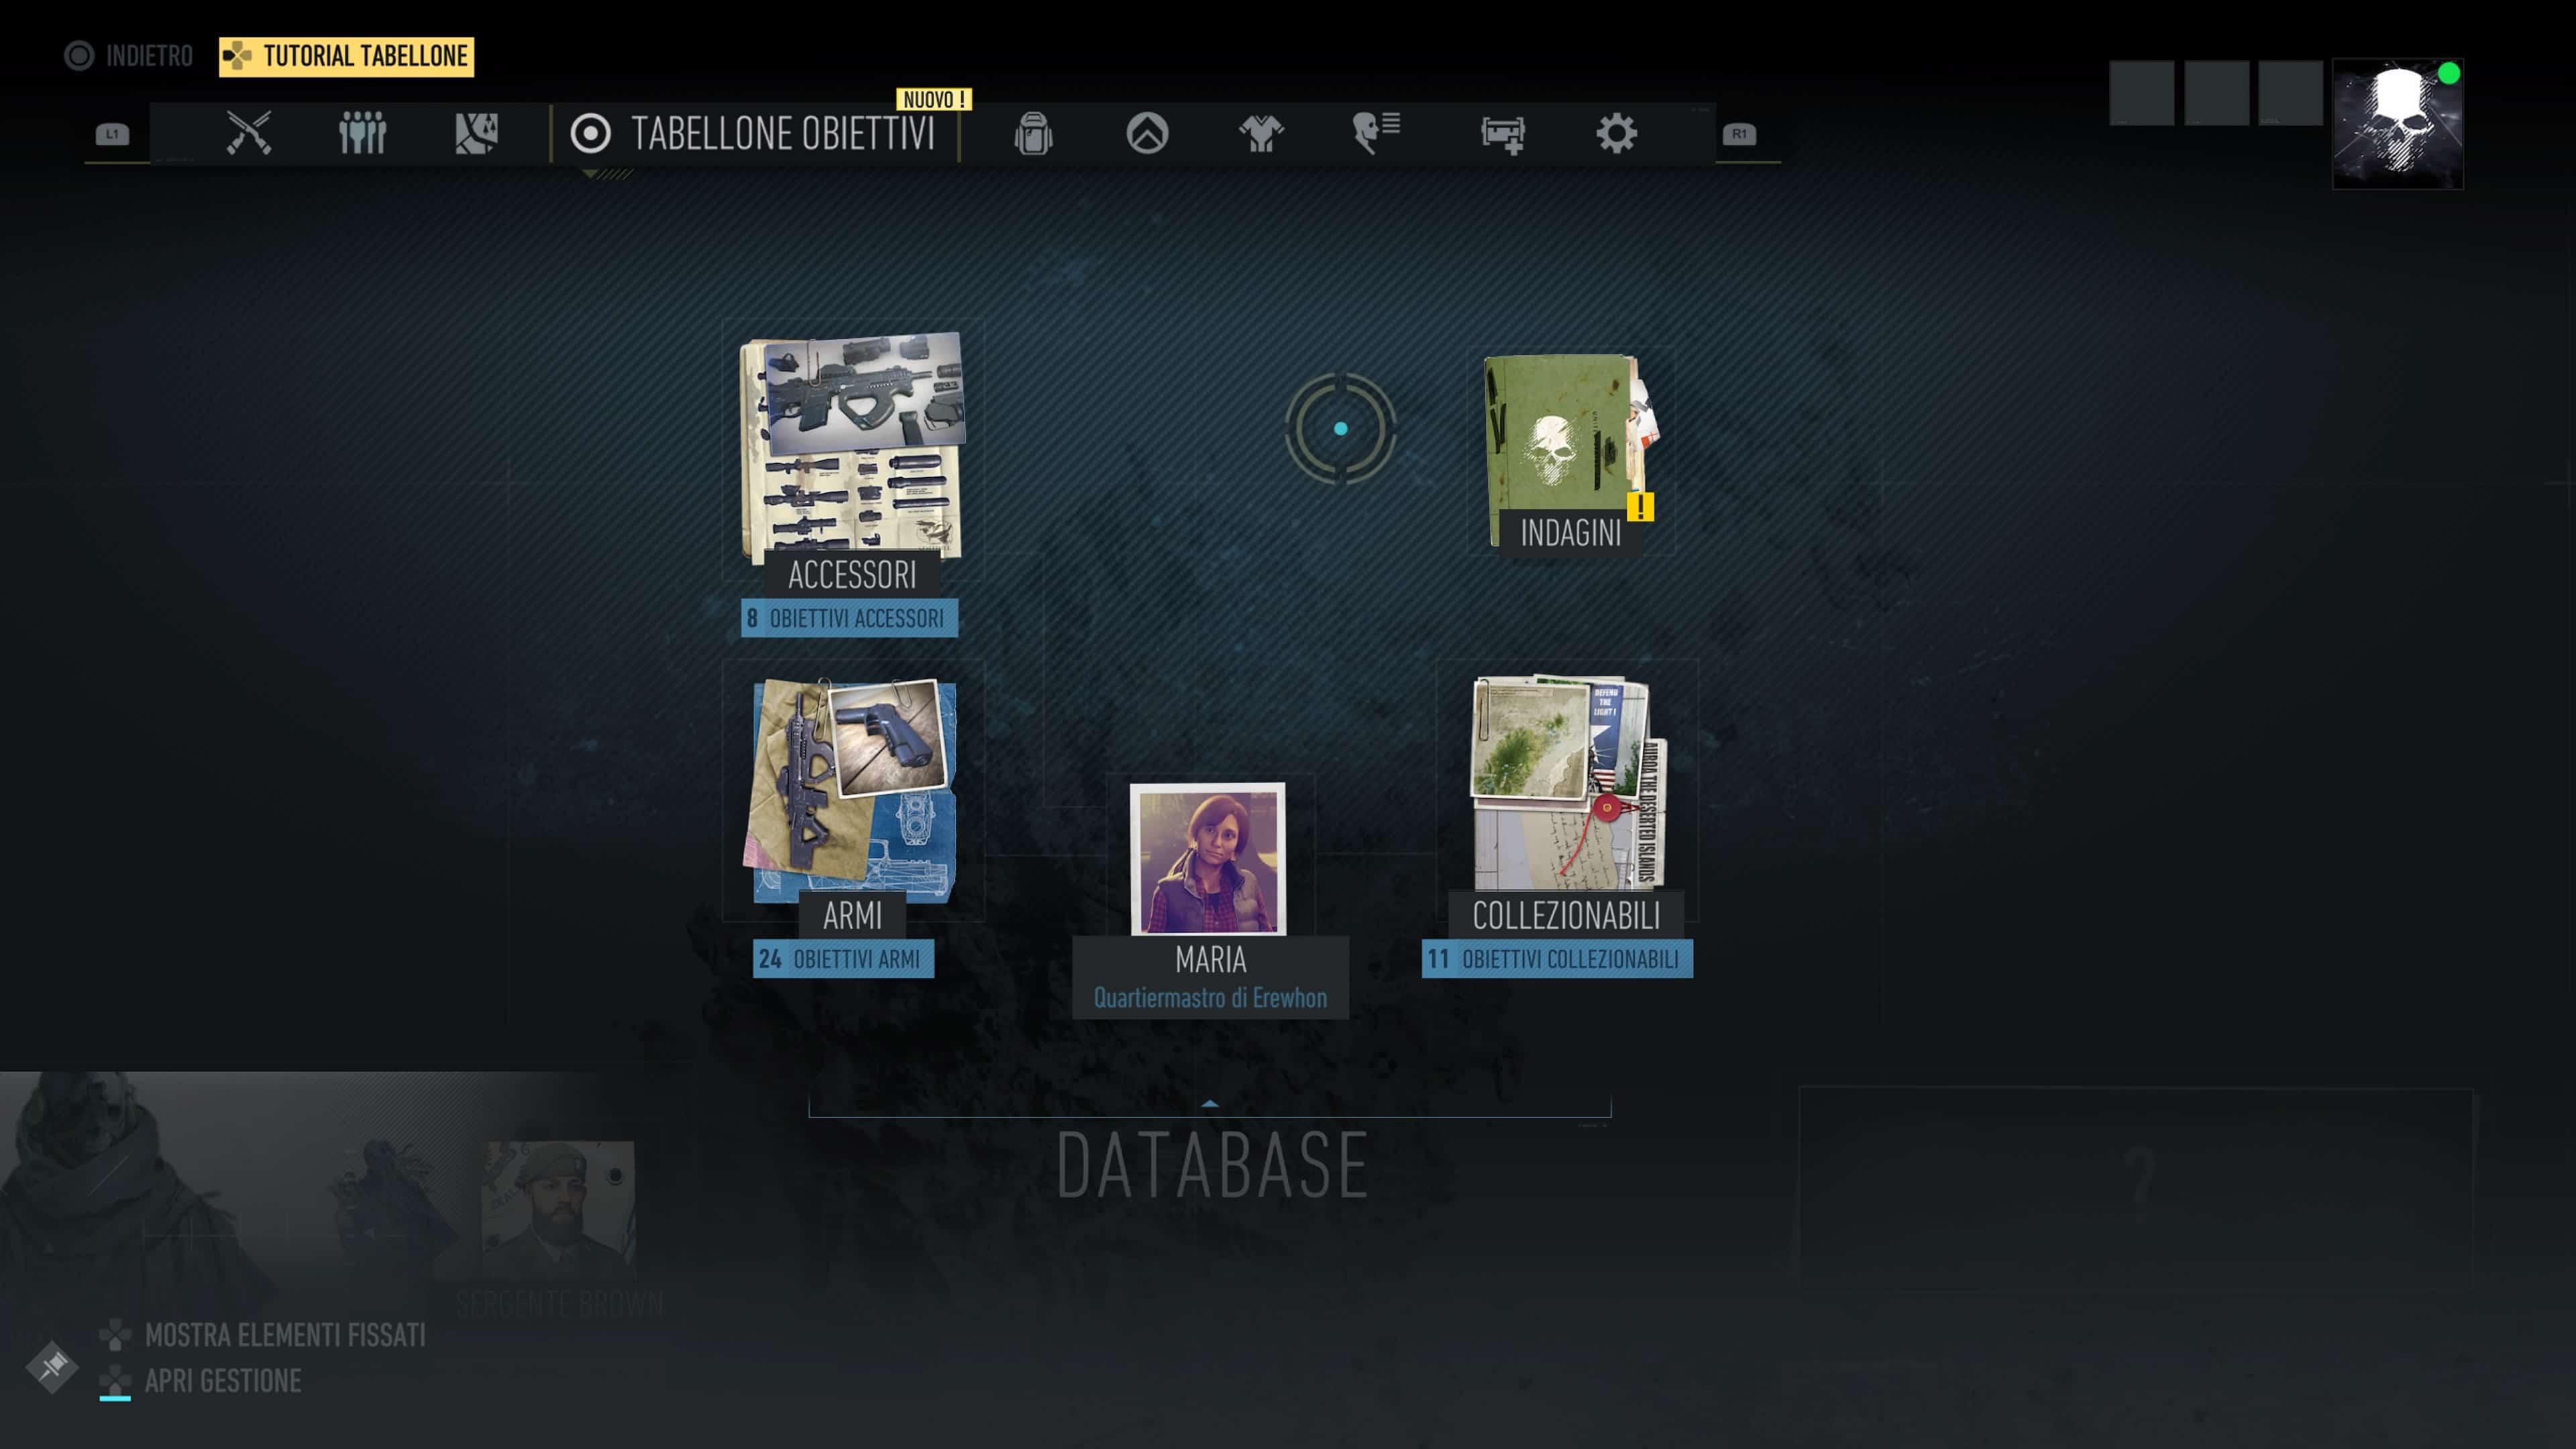 Mondo dei carri armati 8,8 matchmaking